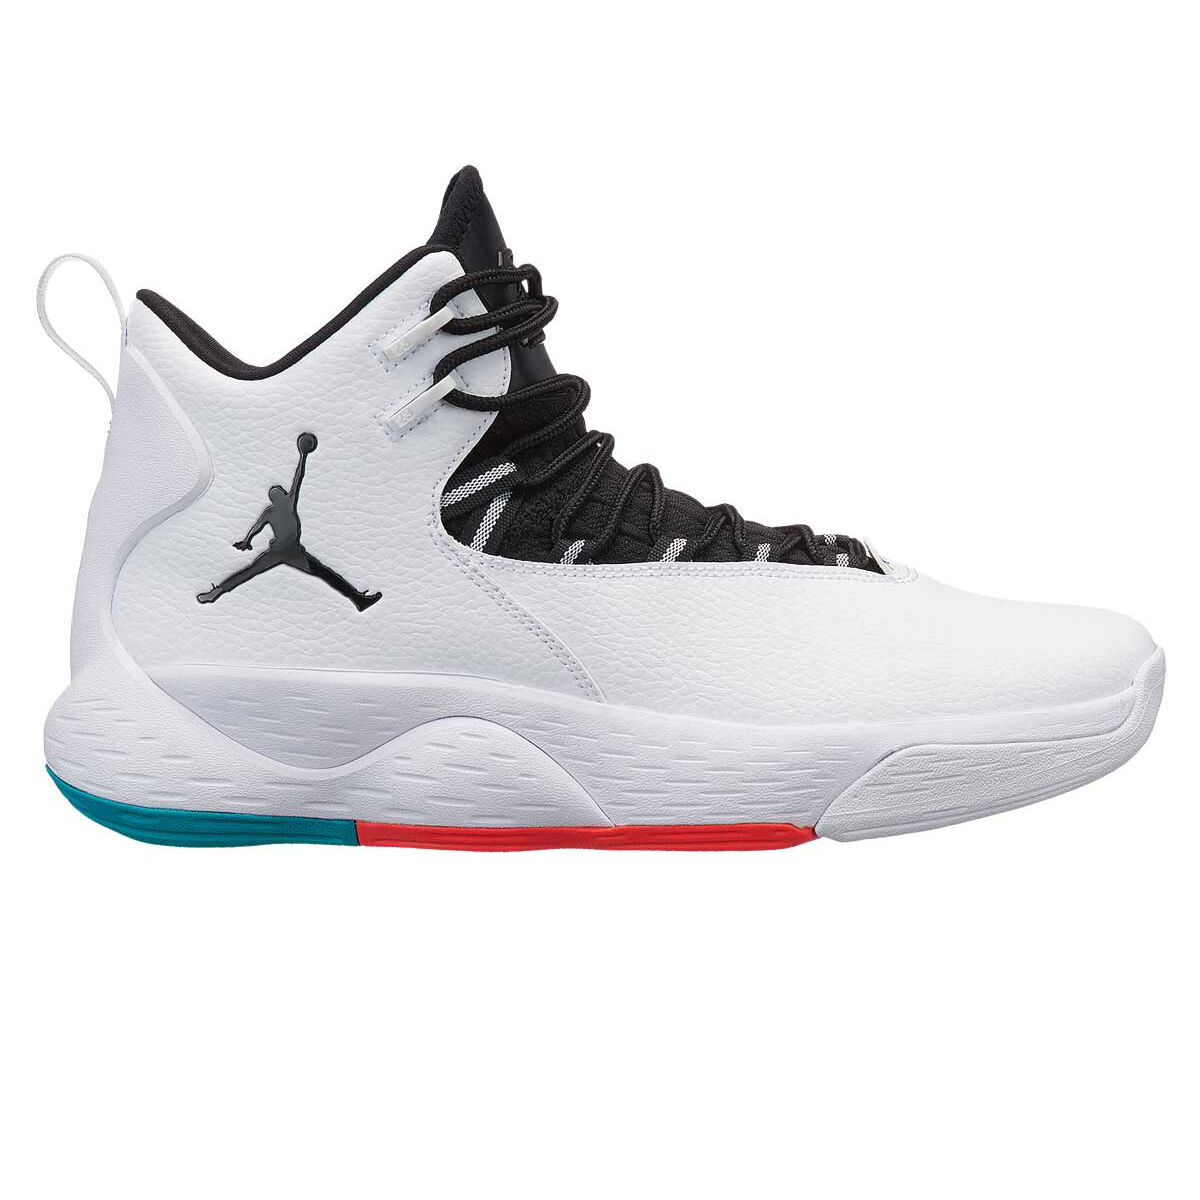 outlet store b5cc3 ca203 promo code nike jordan super.fly mvp mens basketball shoes white black us 7  white